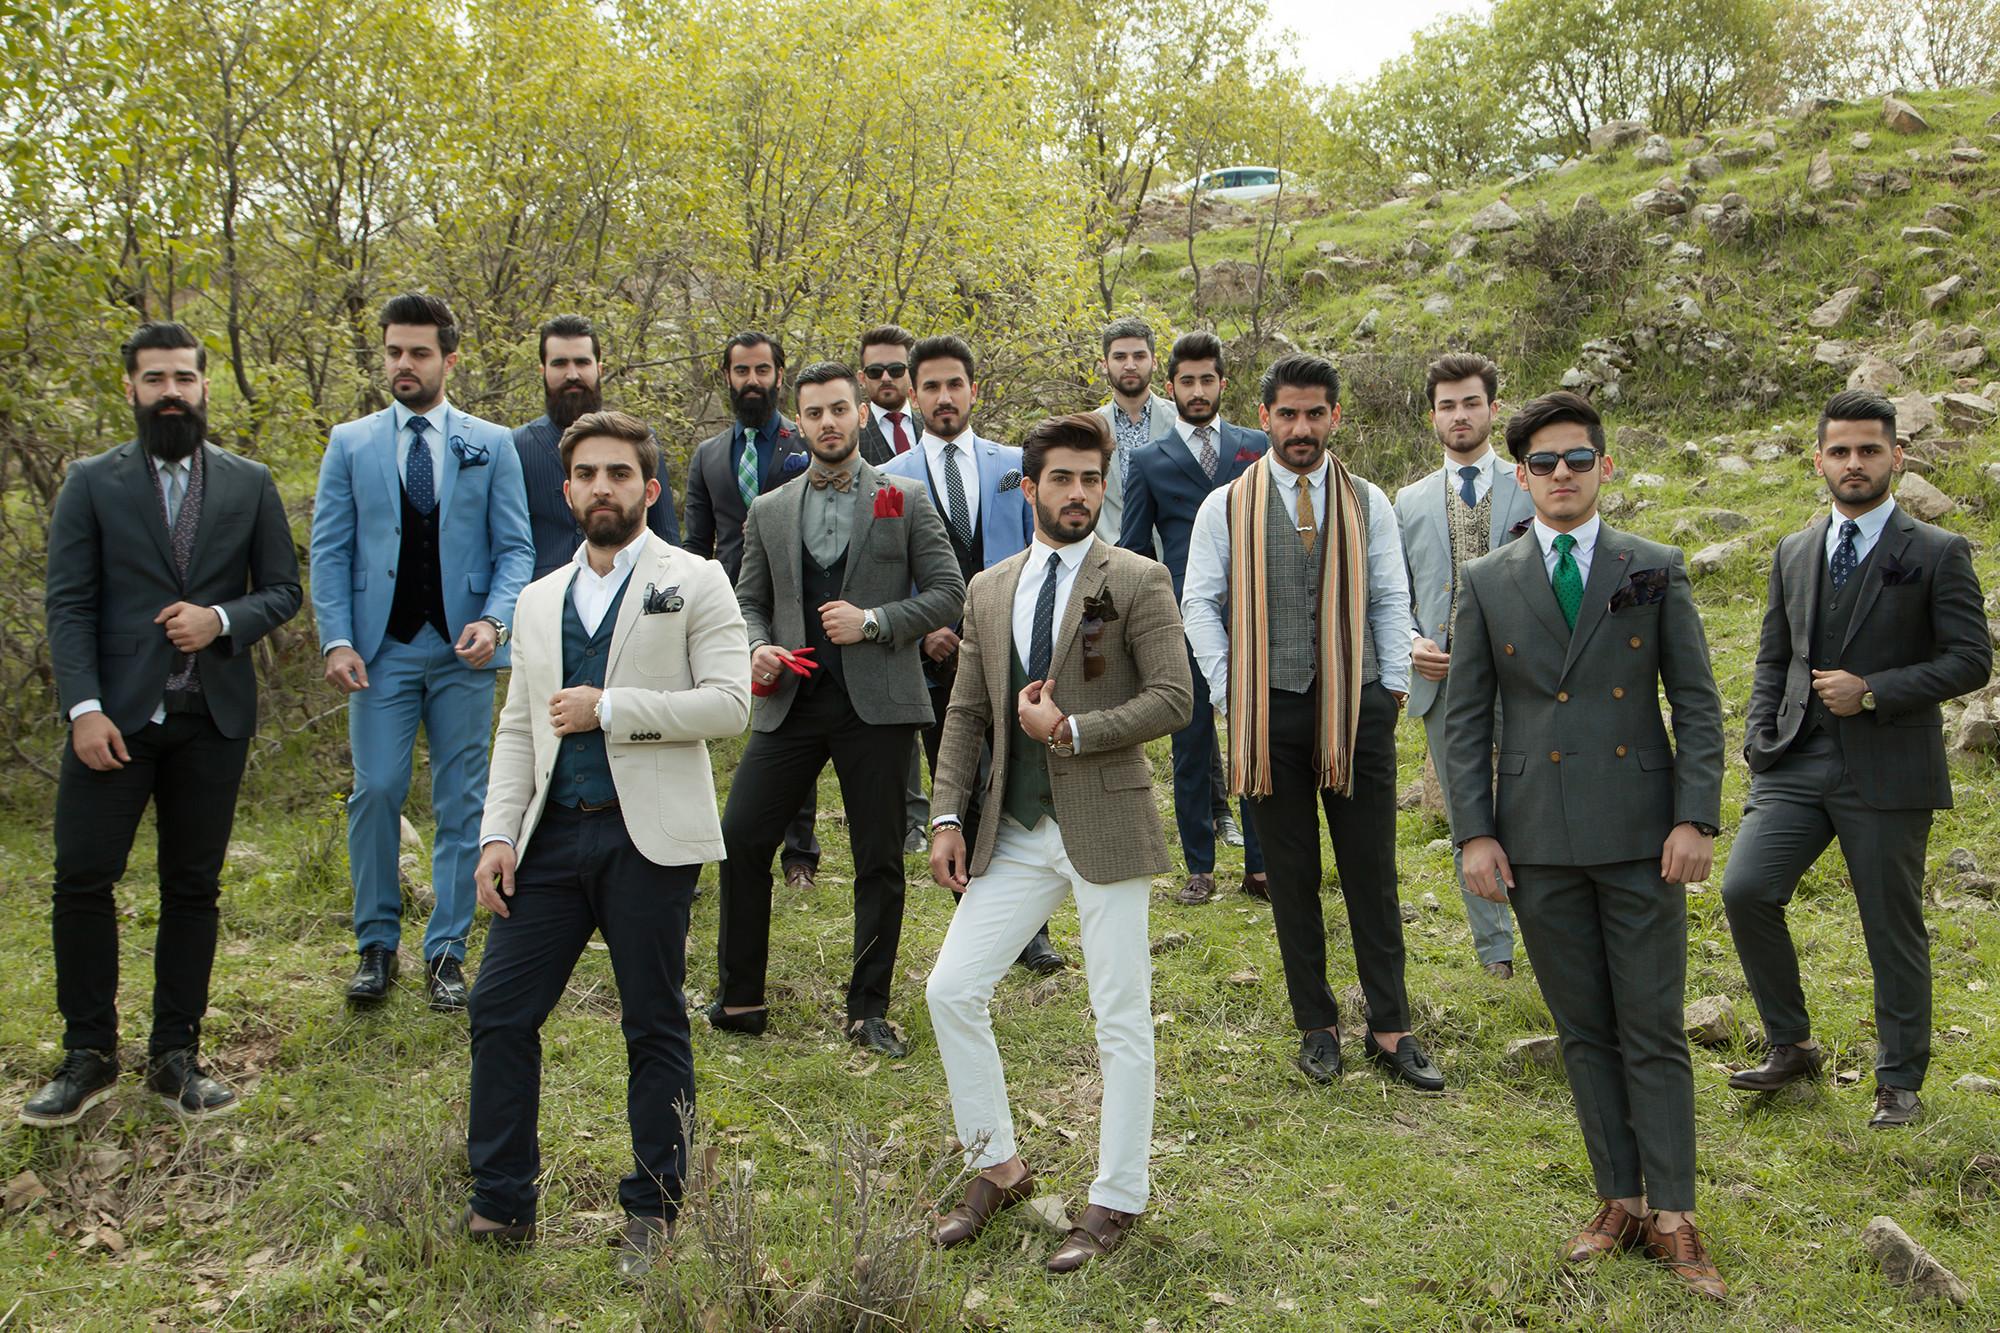 Iraq's First Fashion Club, Iraq's First Fashion Club